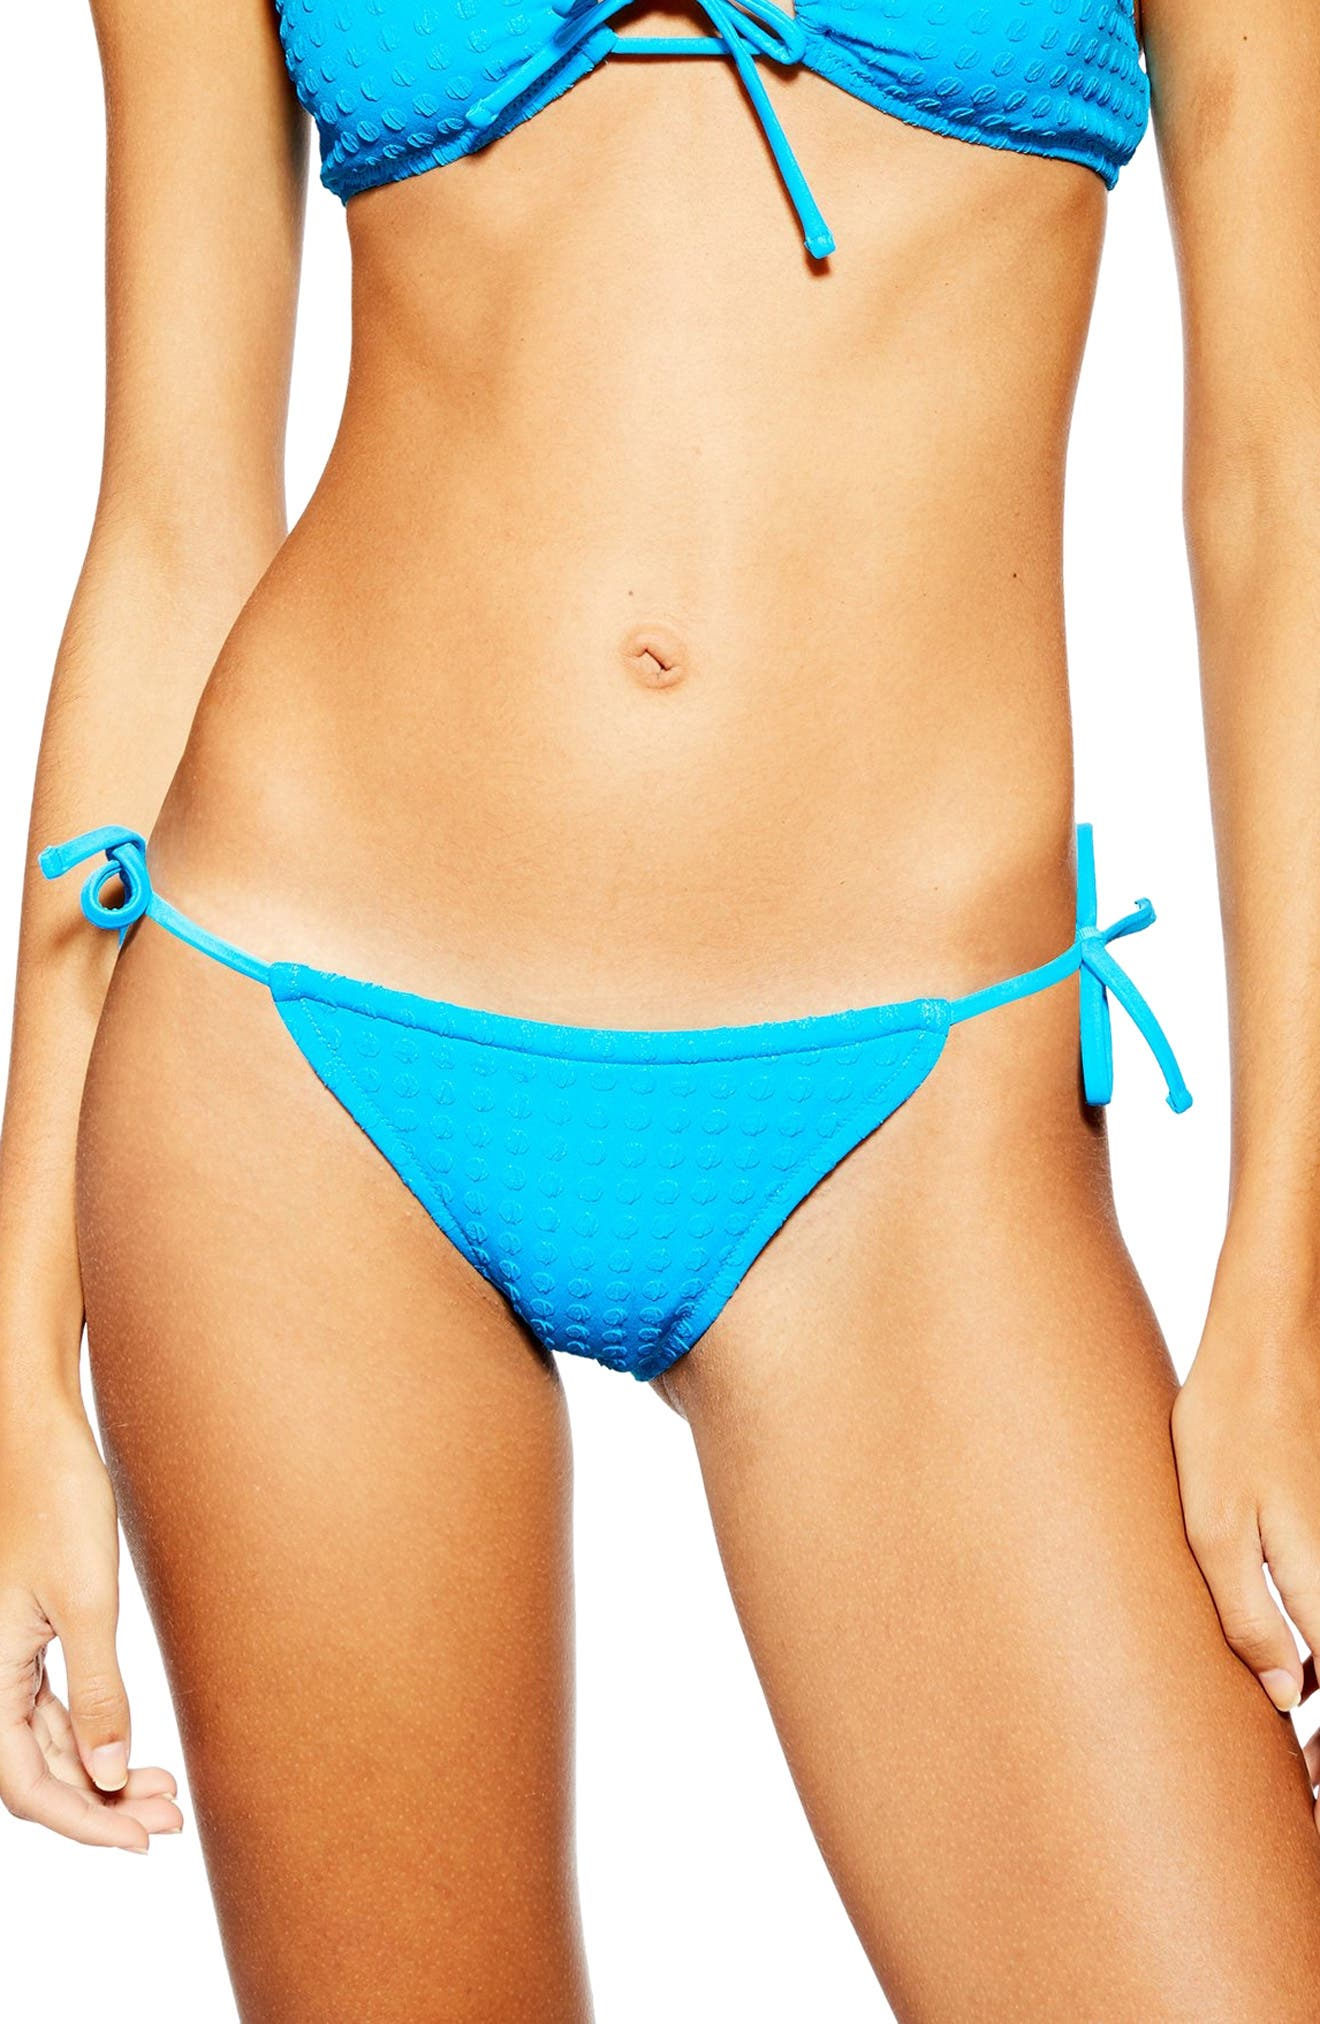 Topshop Seersucker Bikini Bottoms, US (fits like 10-12) - Blue